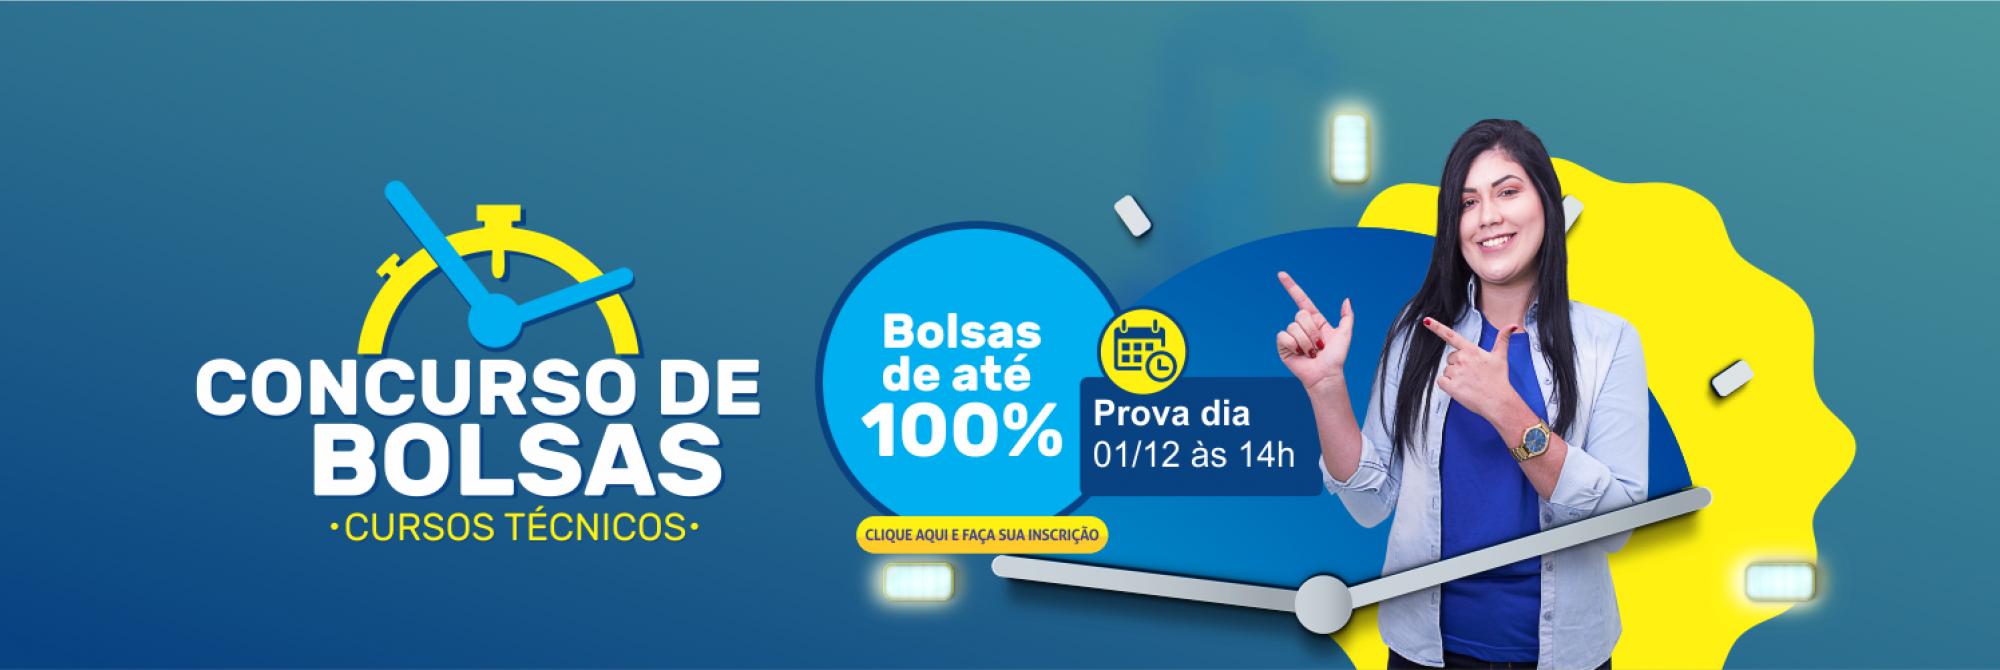 CONCURSO DE BOLSAS